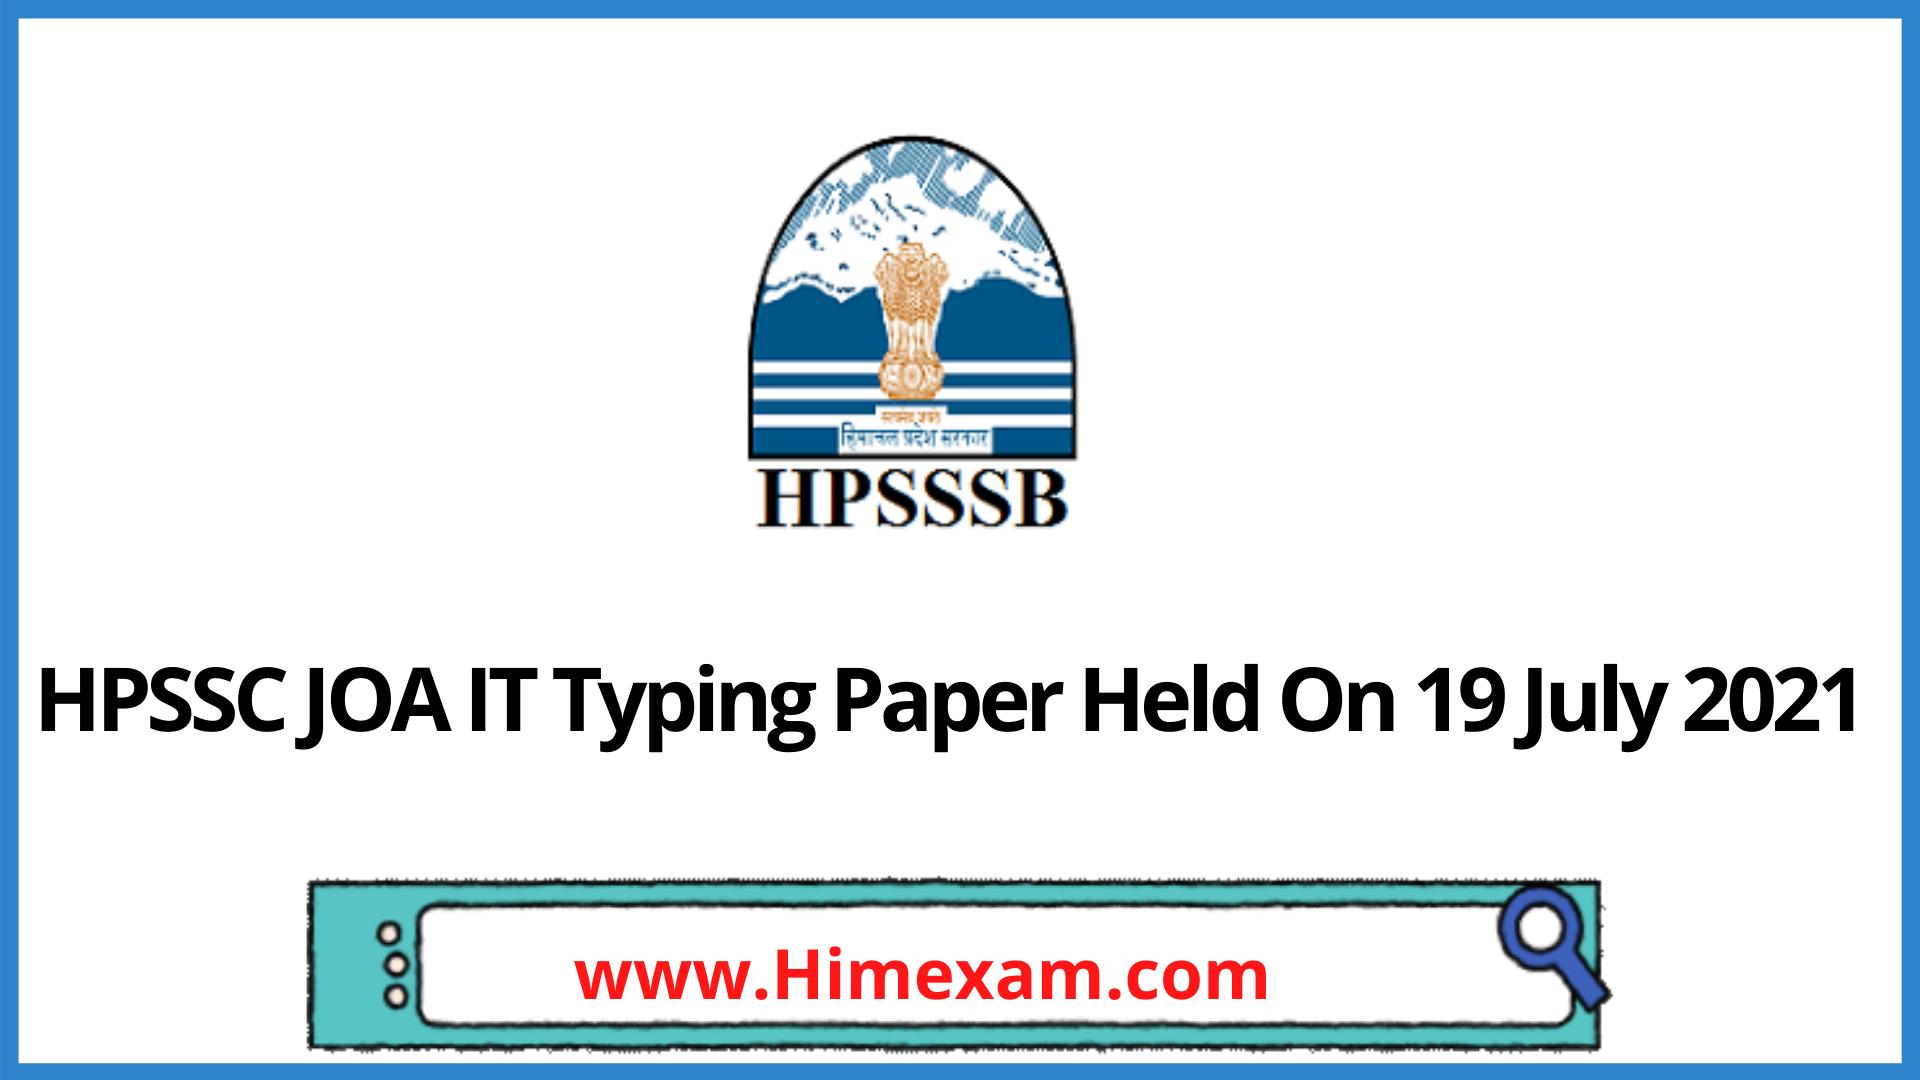 HPSSC JOA IT Typing Paper Held On 19 July 2021